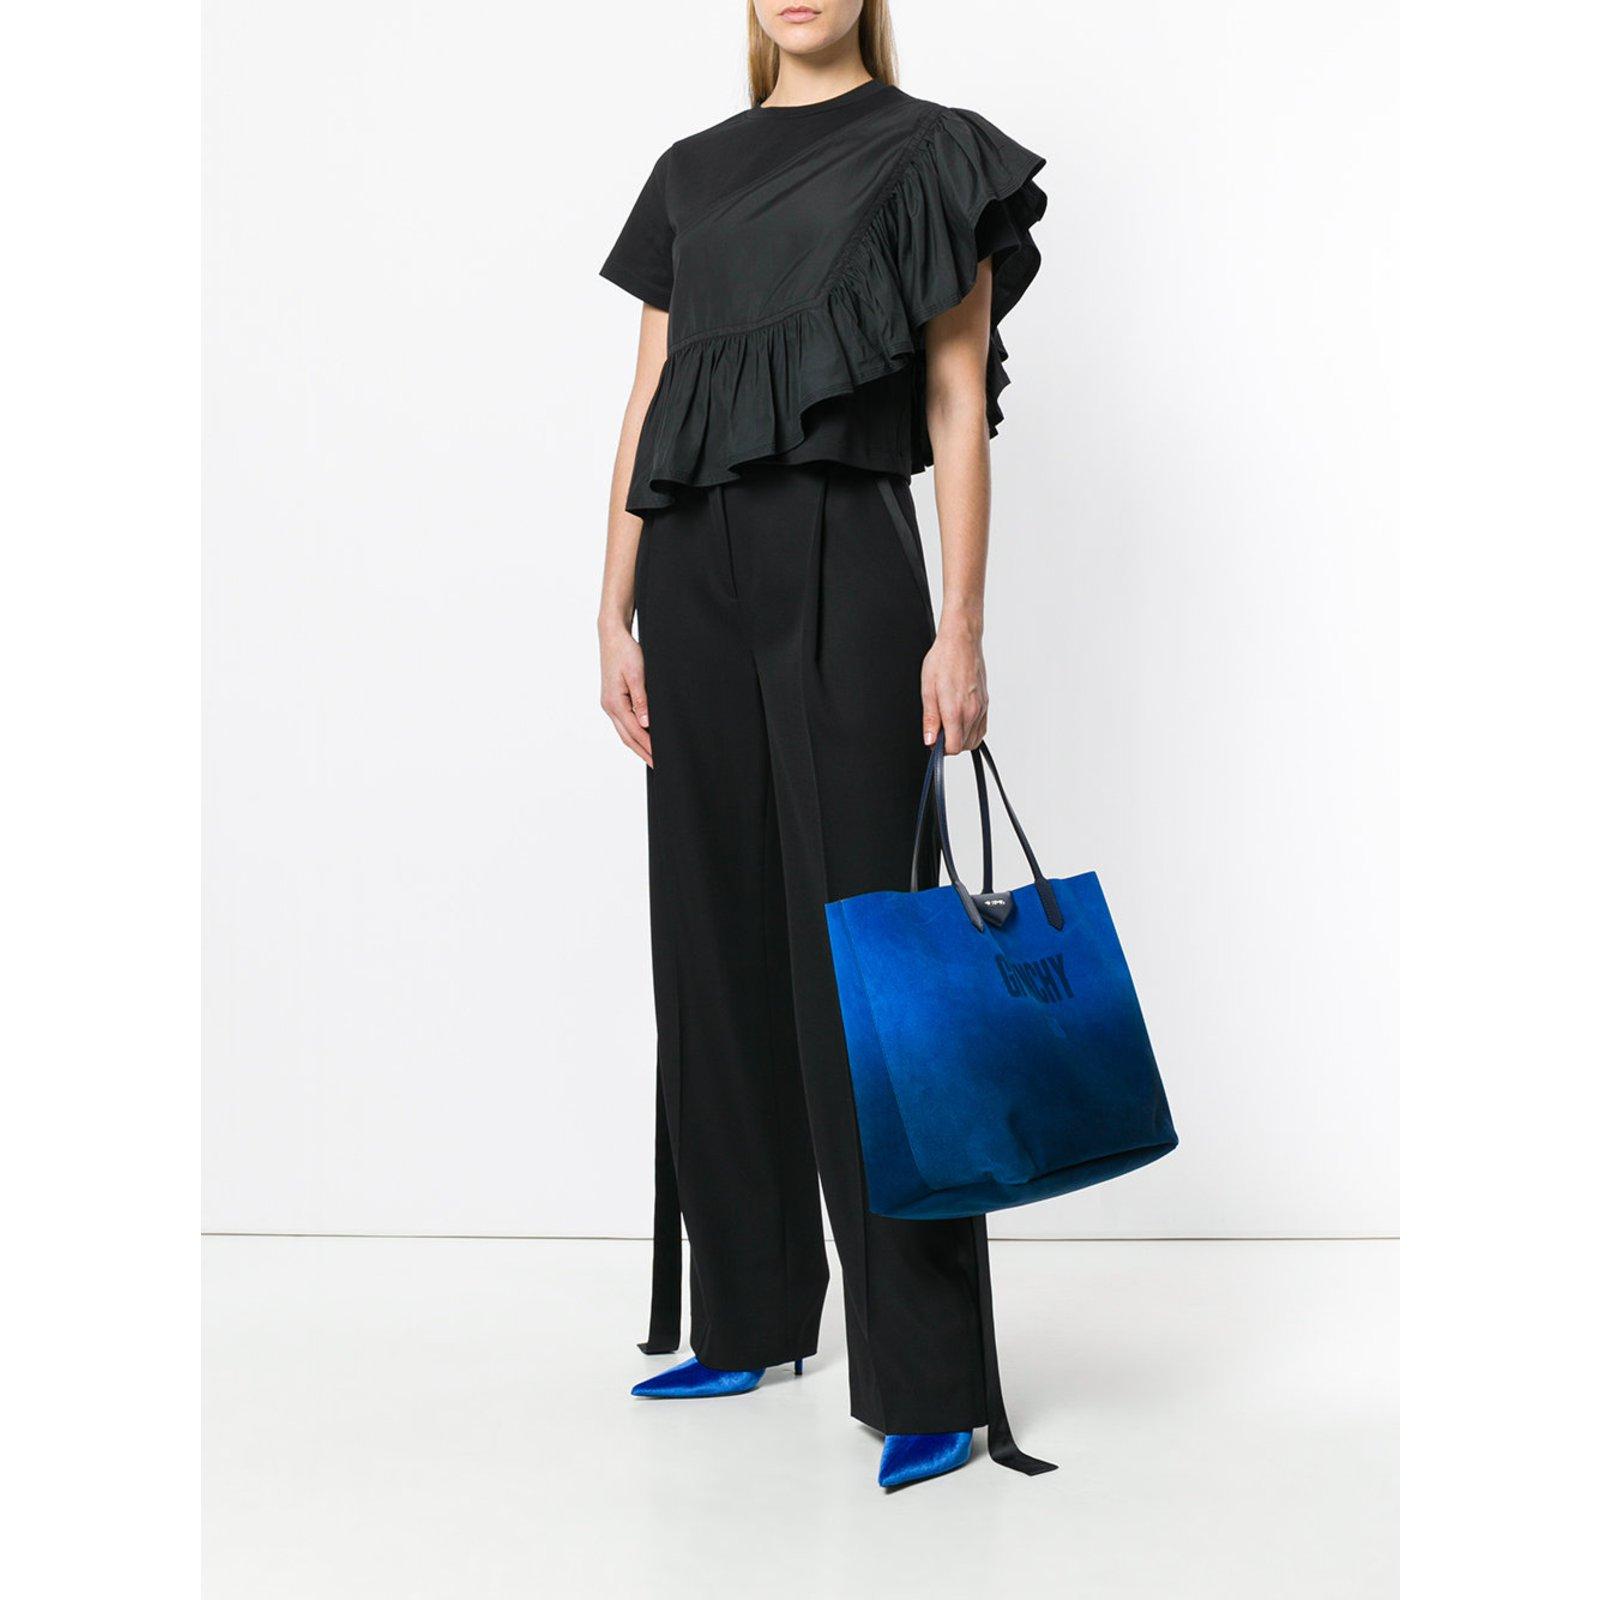 Antigona bleu Reversible Cabas Givenchy Sacs Ref Main À Argenté Cuir qvwf6vIOxT